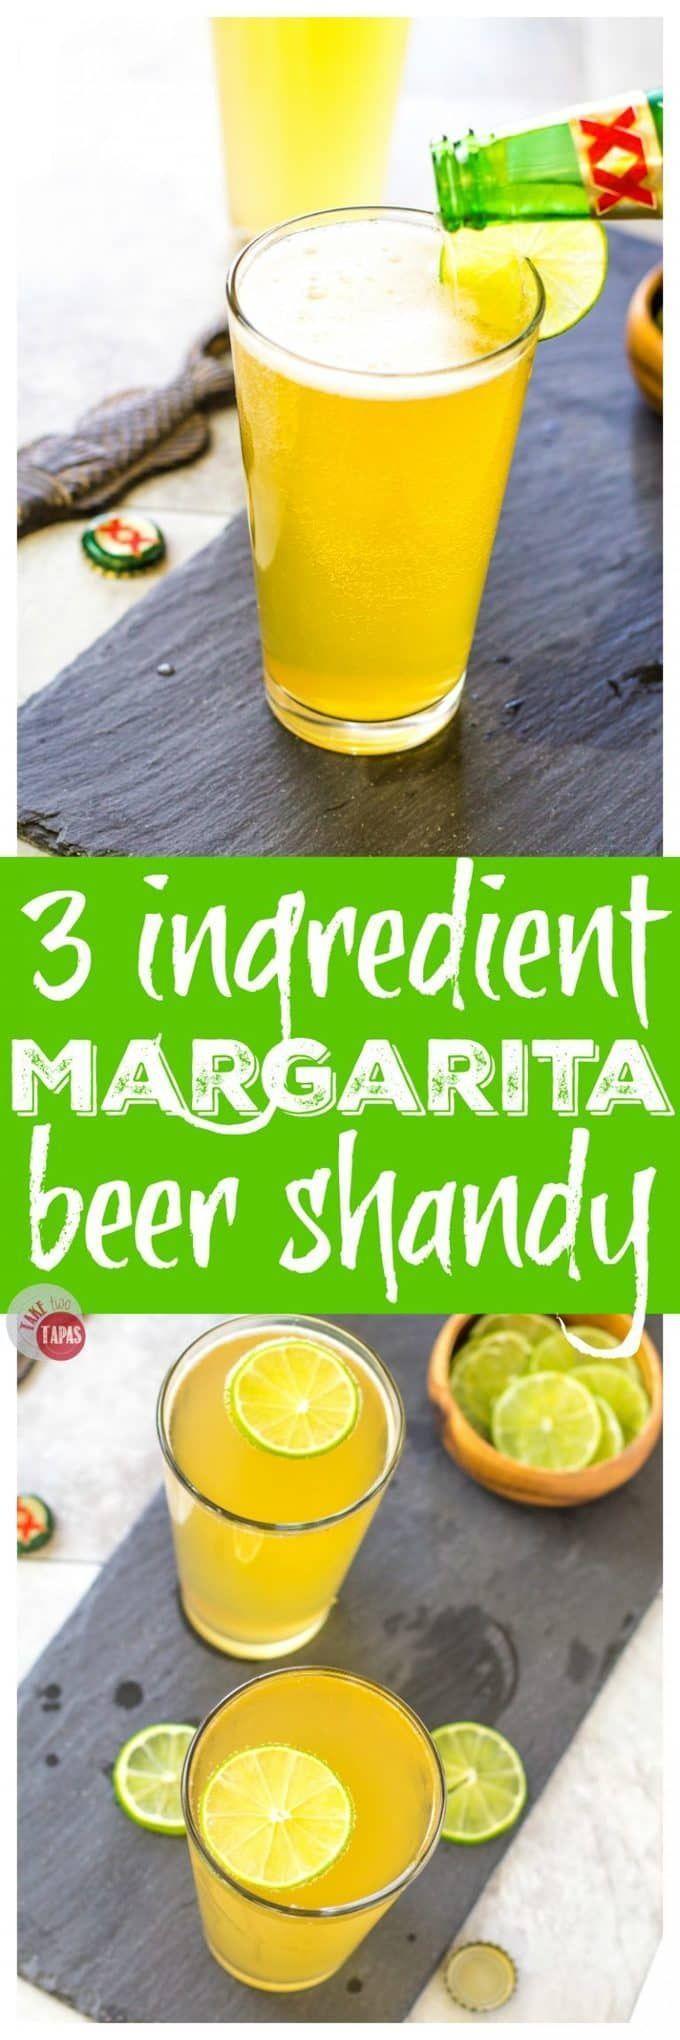 Margarita Beer Shandy with 3 Ingredients   Take Two Tapas